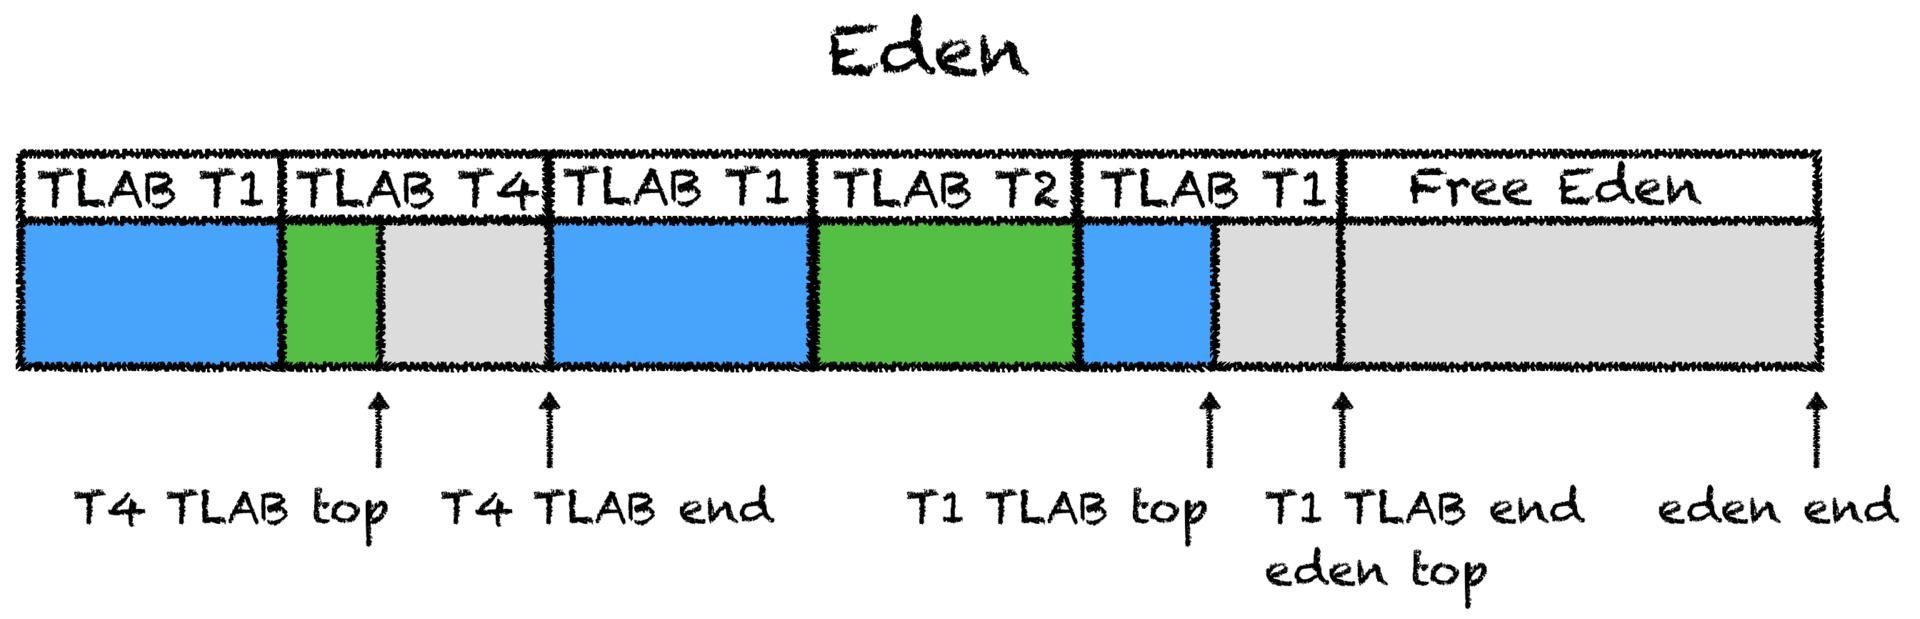 Как JVM аллоцирует объекты? - 2